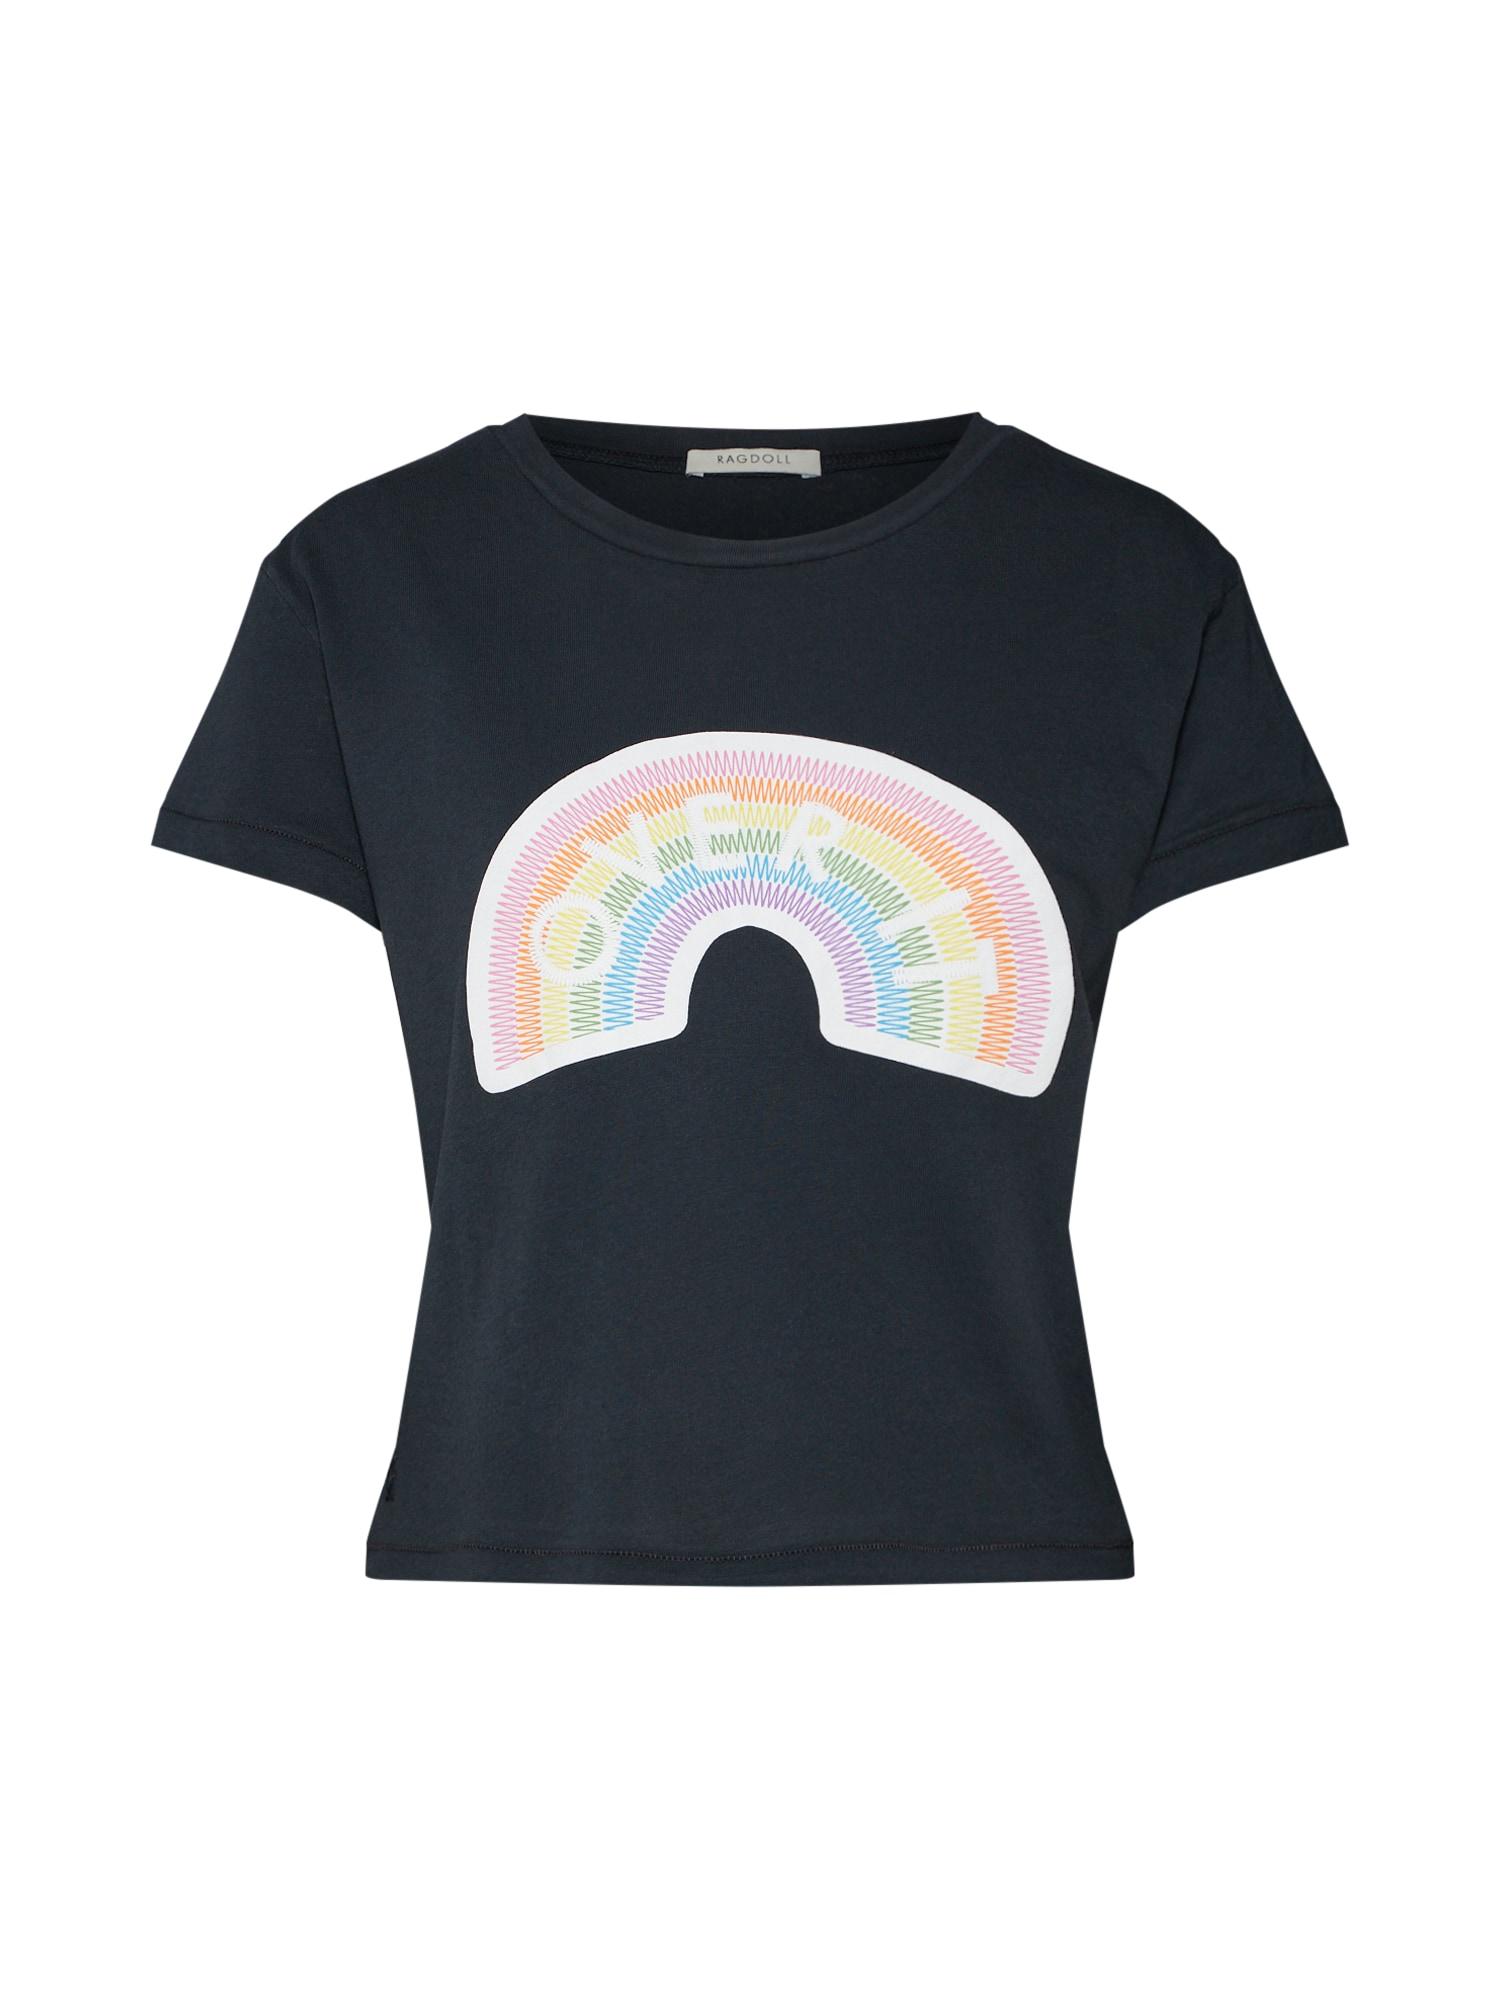 Tričko Rainbow Cropped Tee černá Ragdoll LA